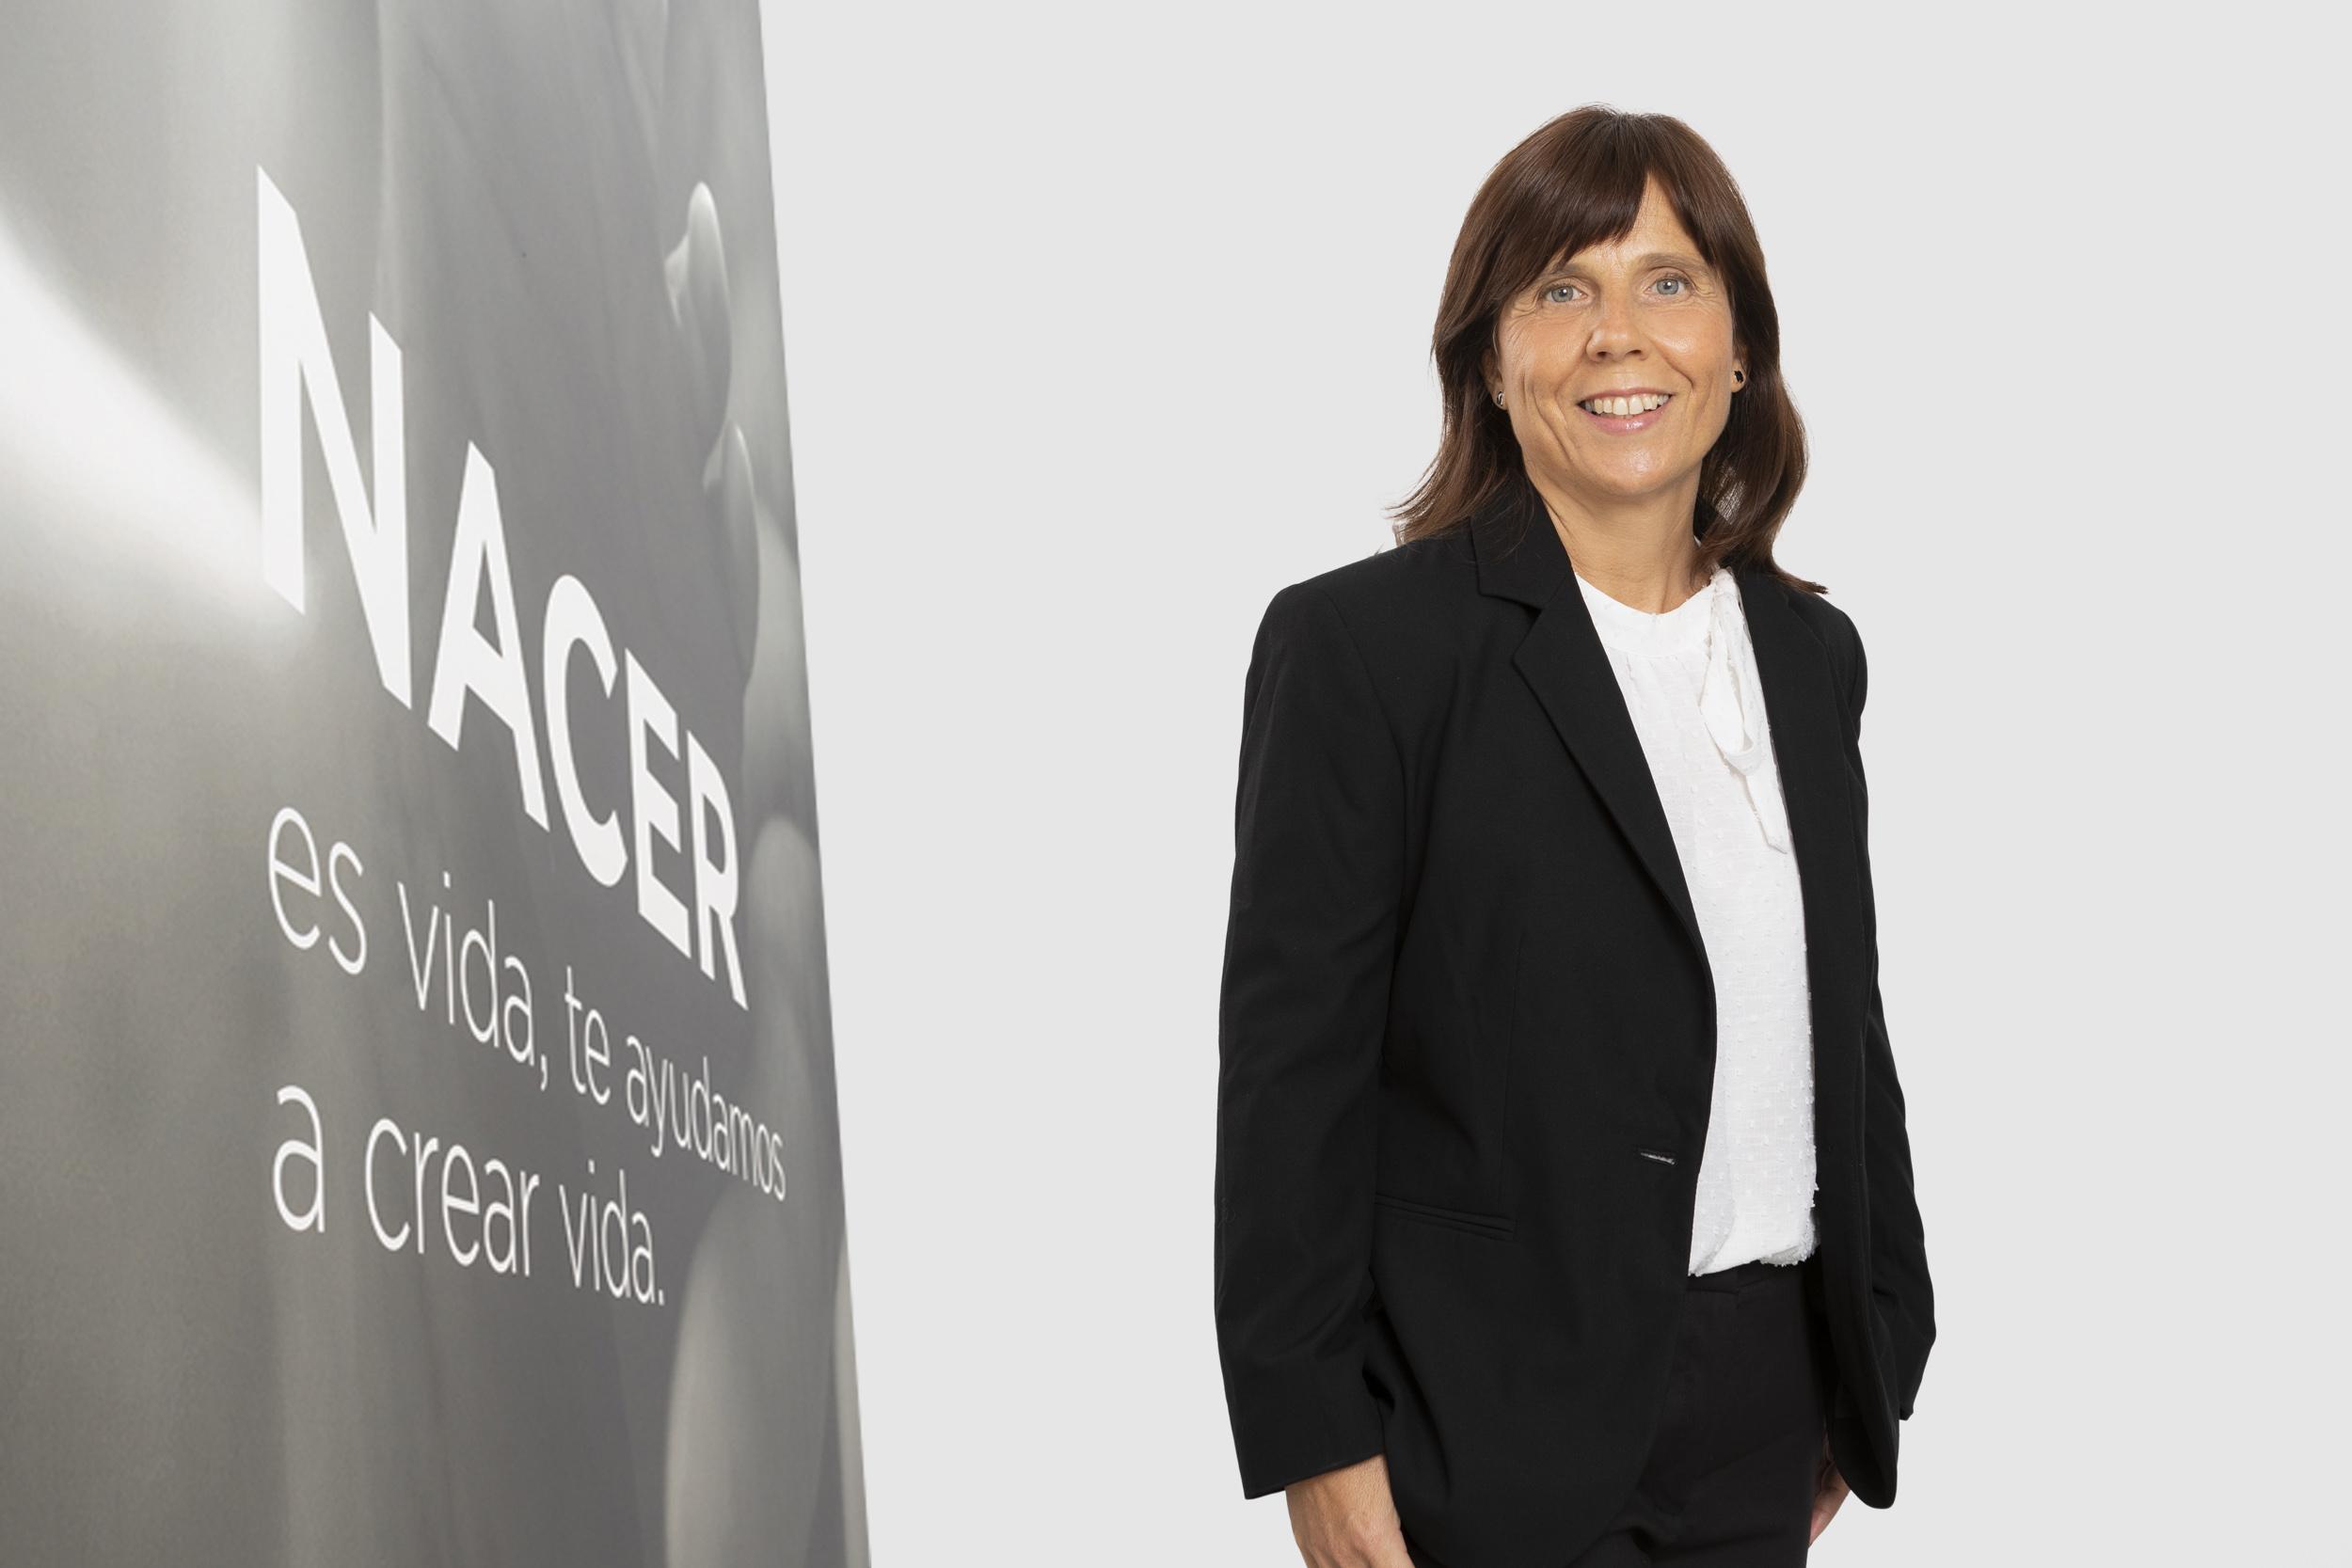 Mayte Montagut